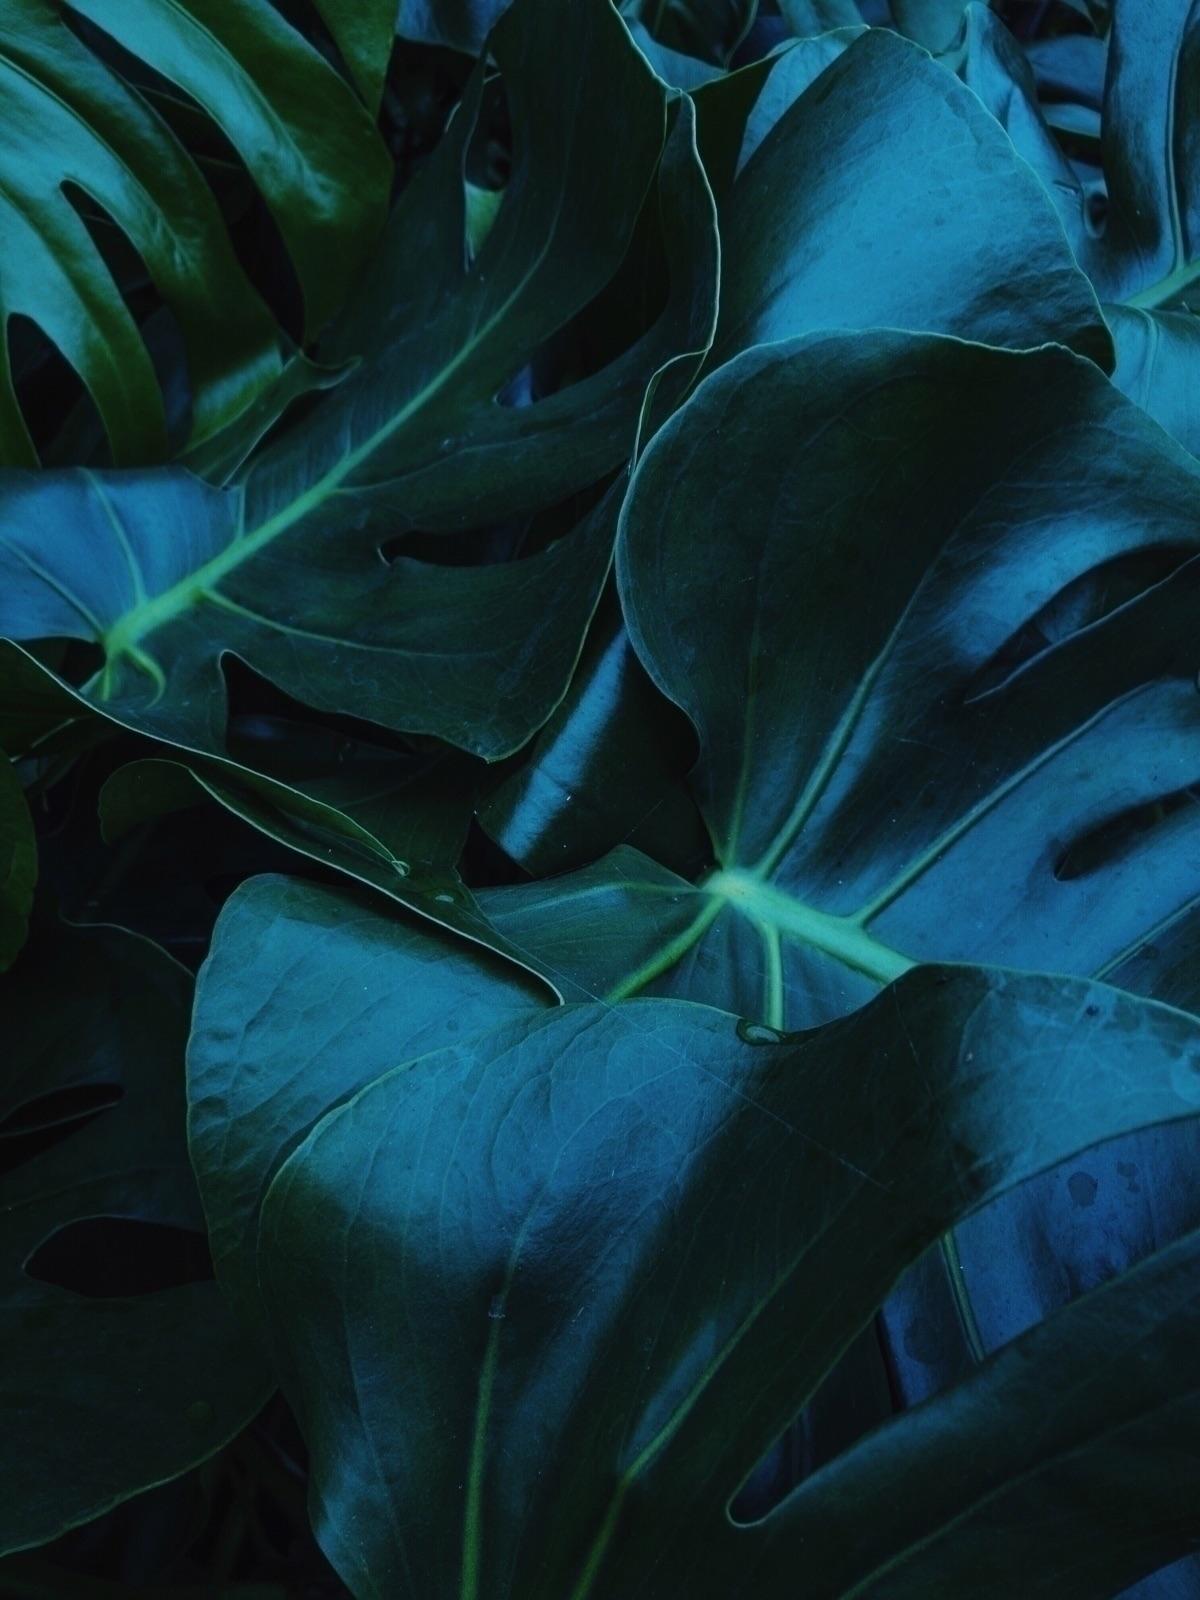 leaf, monstera, lowlight, closeup - oliviermorisse | ello